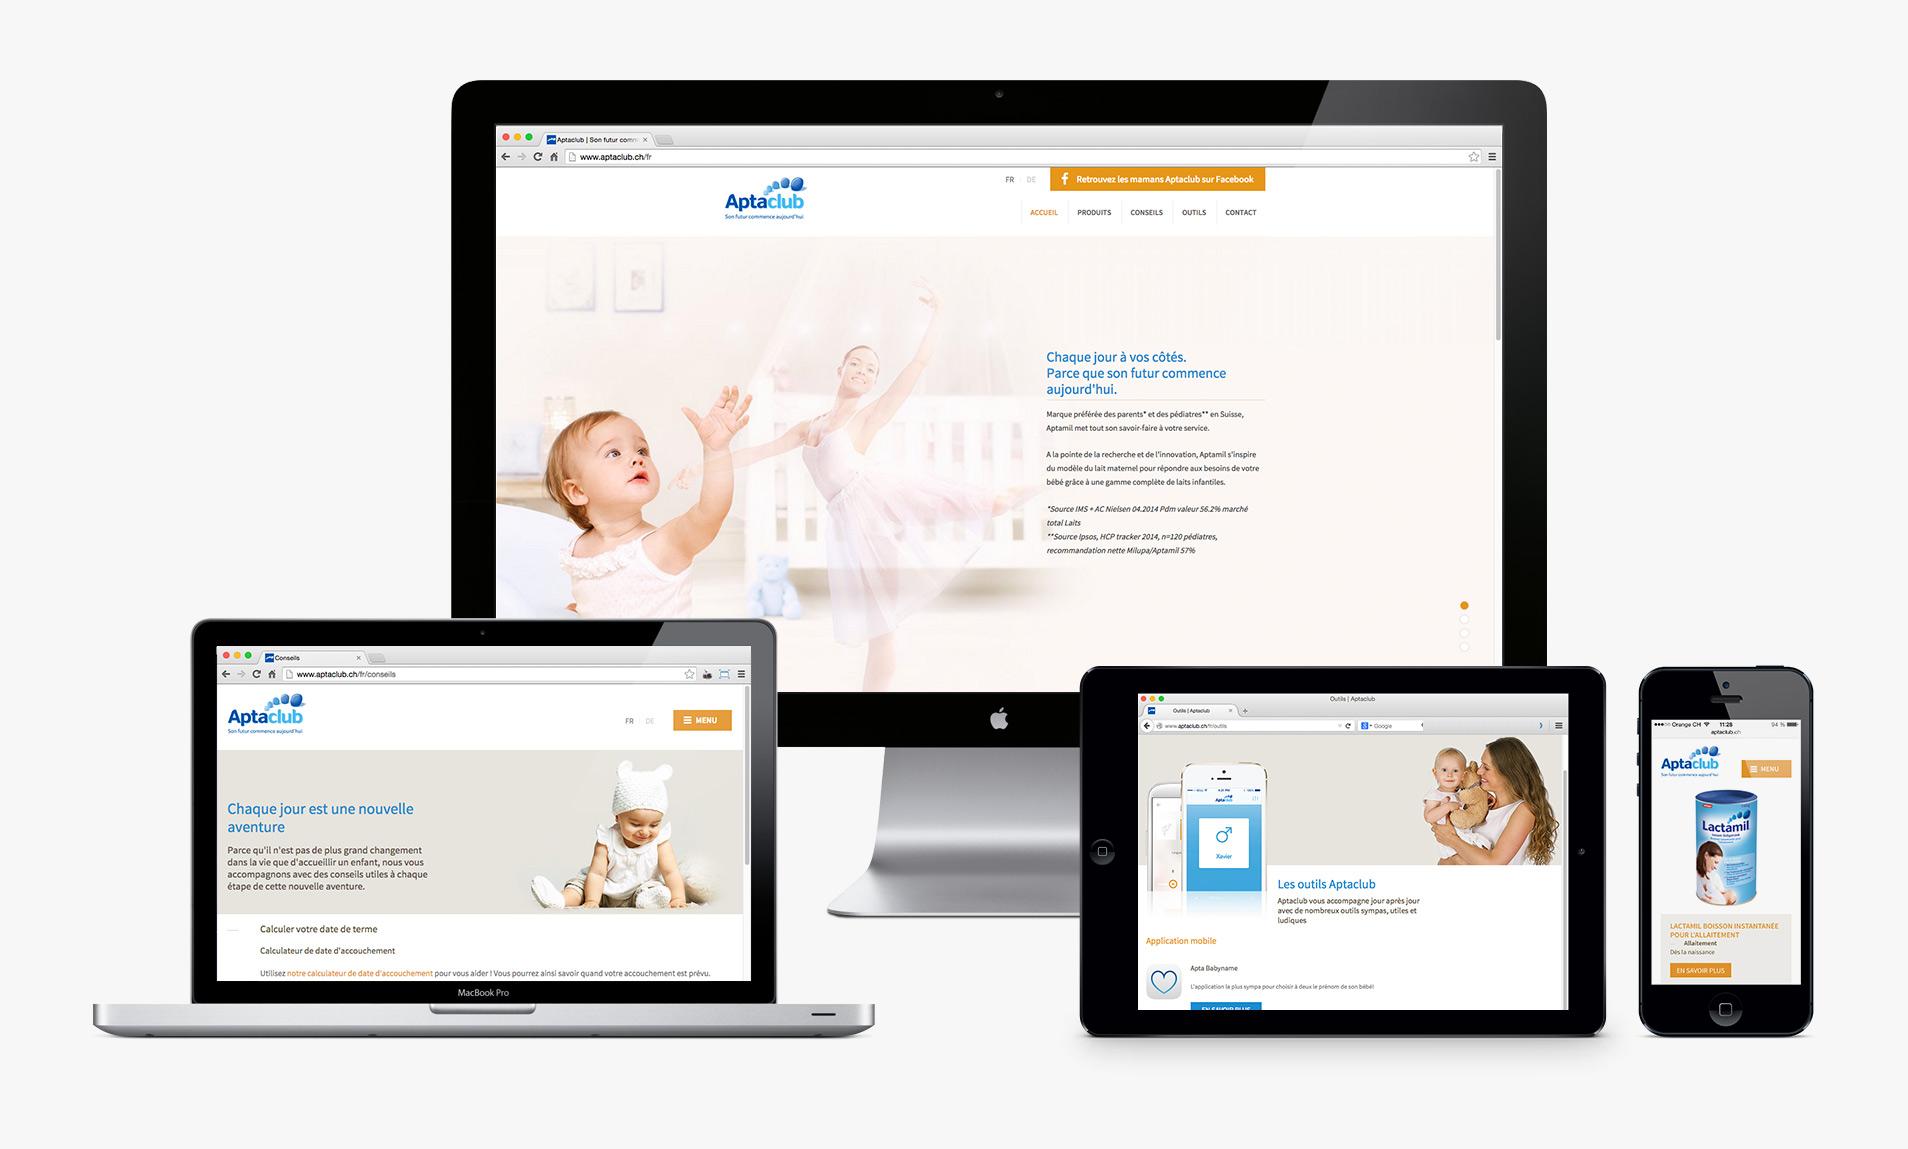 Aptaclub's website responsivity